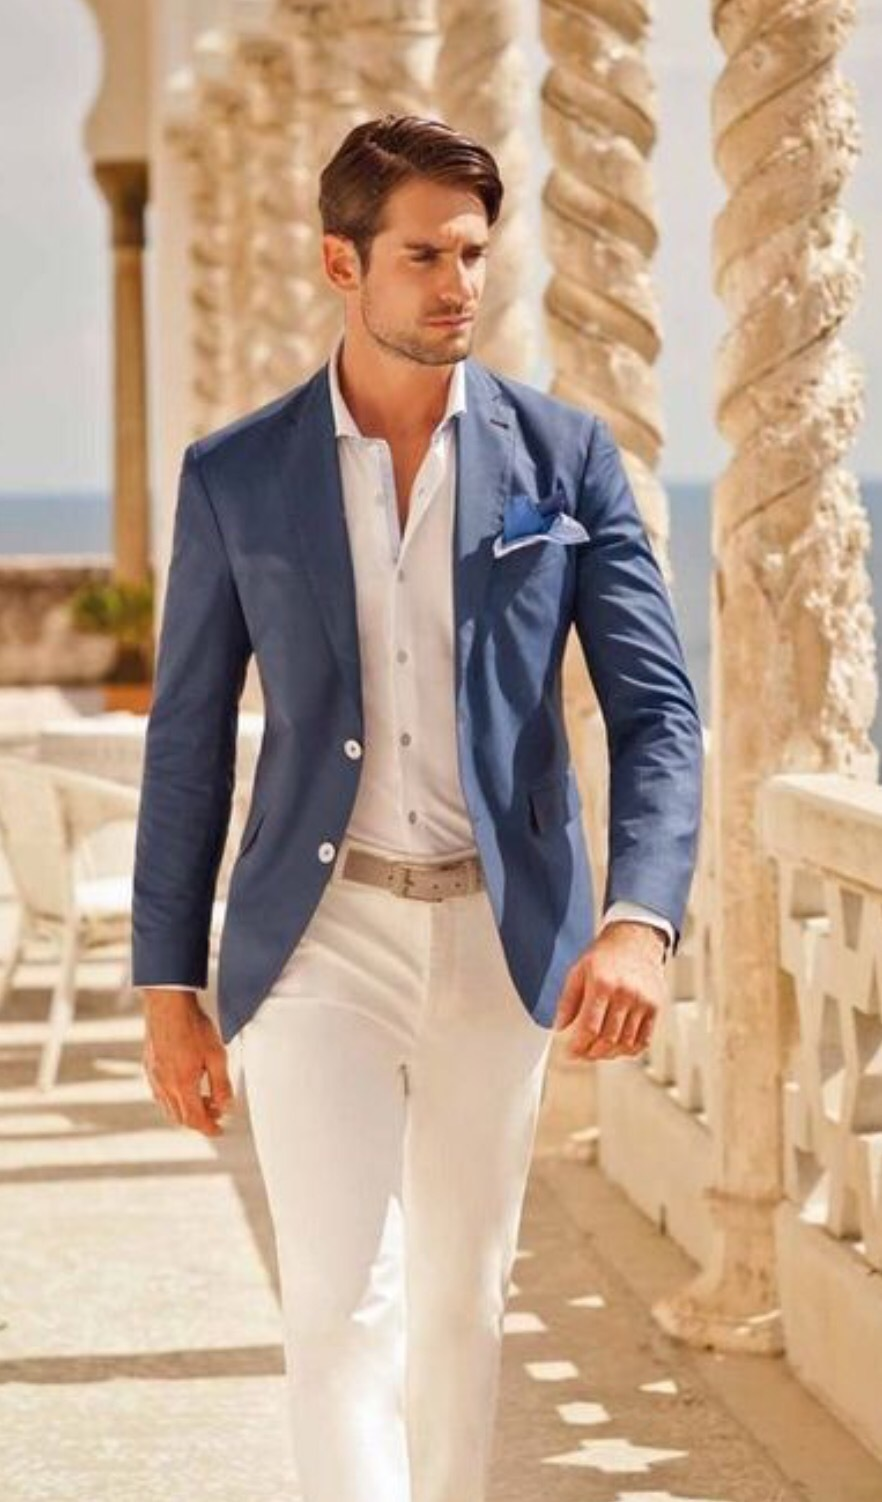 9481db70ee Beach Chic Dress Code Man - Photo Dress Wallpaper HD AOrg